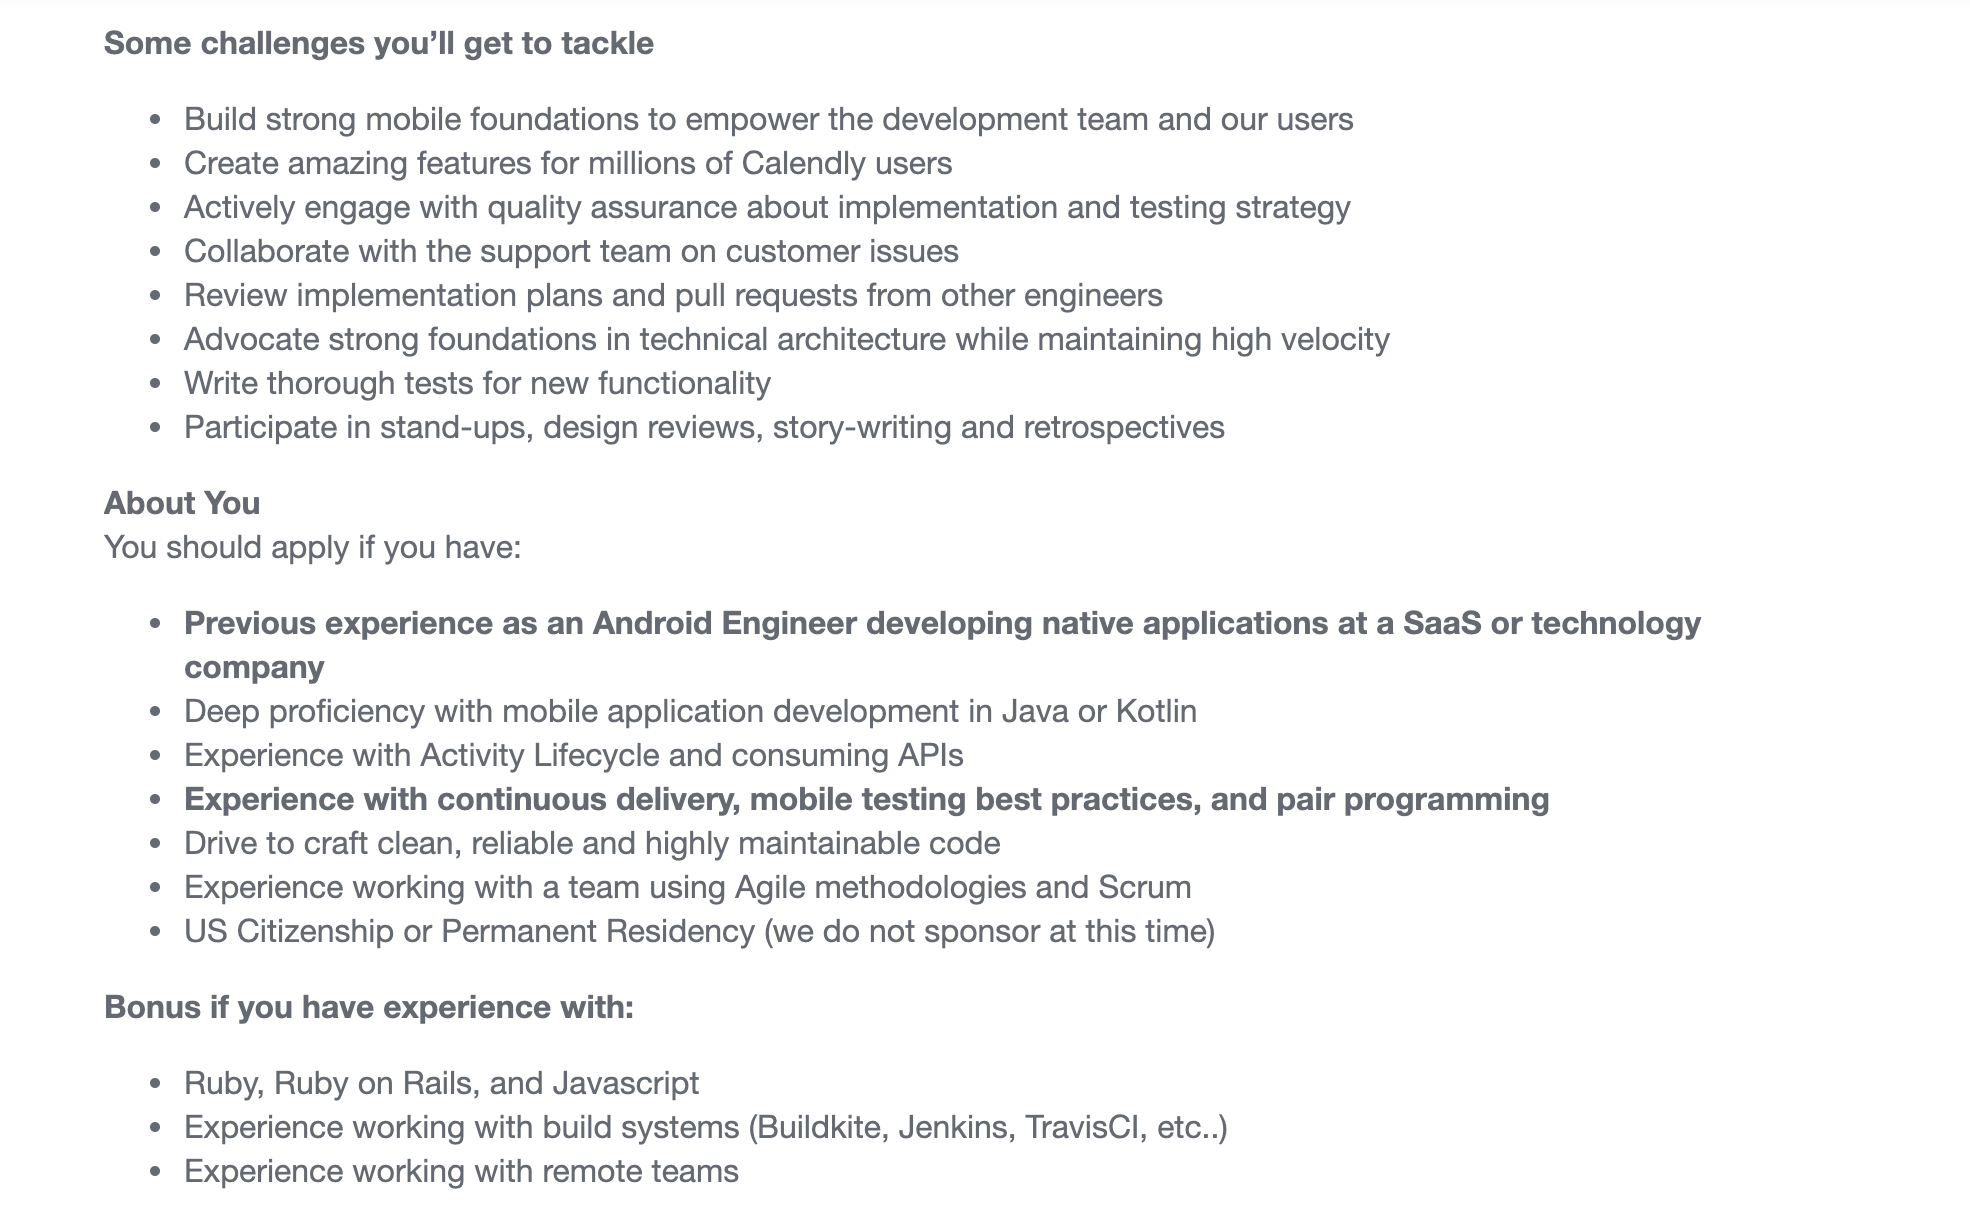 Senior Android Engineer Job Description for Calendly